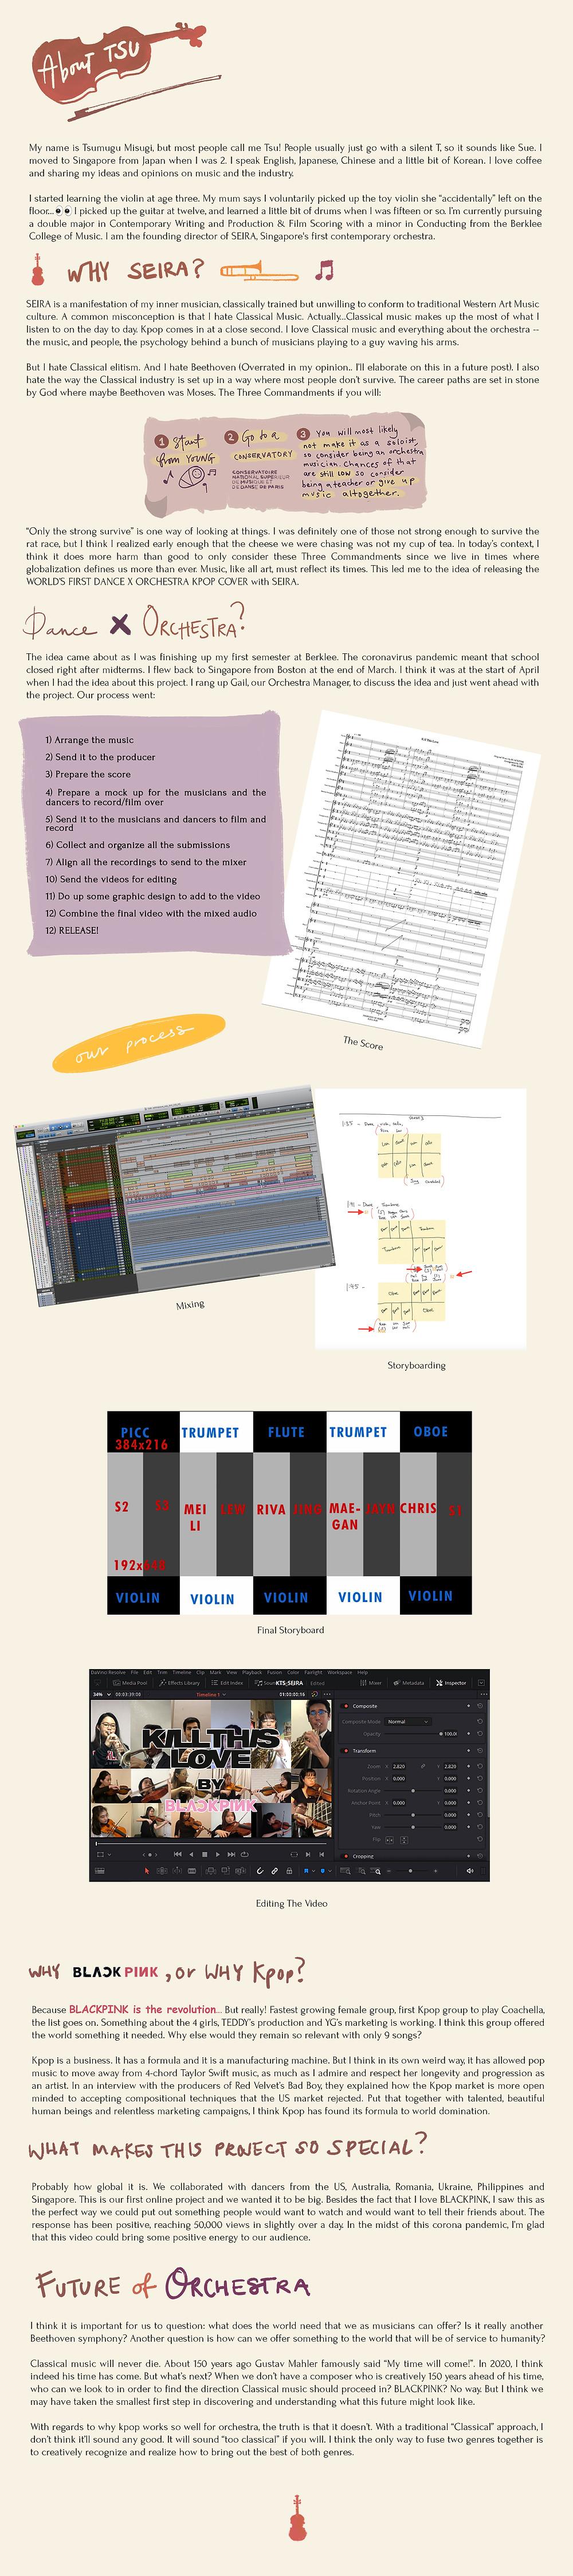 blurb magazine. blurbmag. Orchestrating KPOP. Tsumugu Misugi. Arts & Culture. @blurb.mag